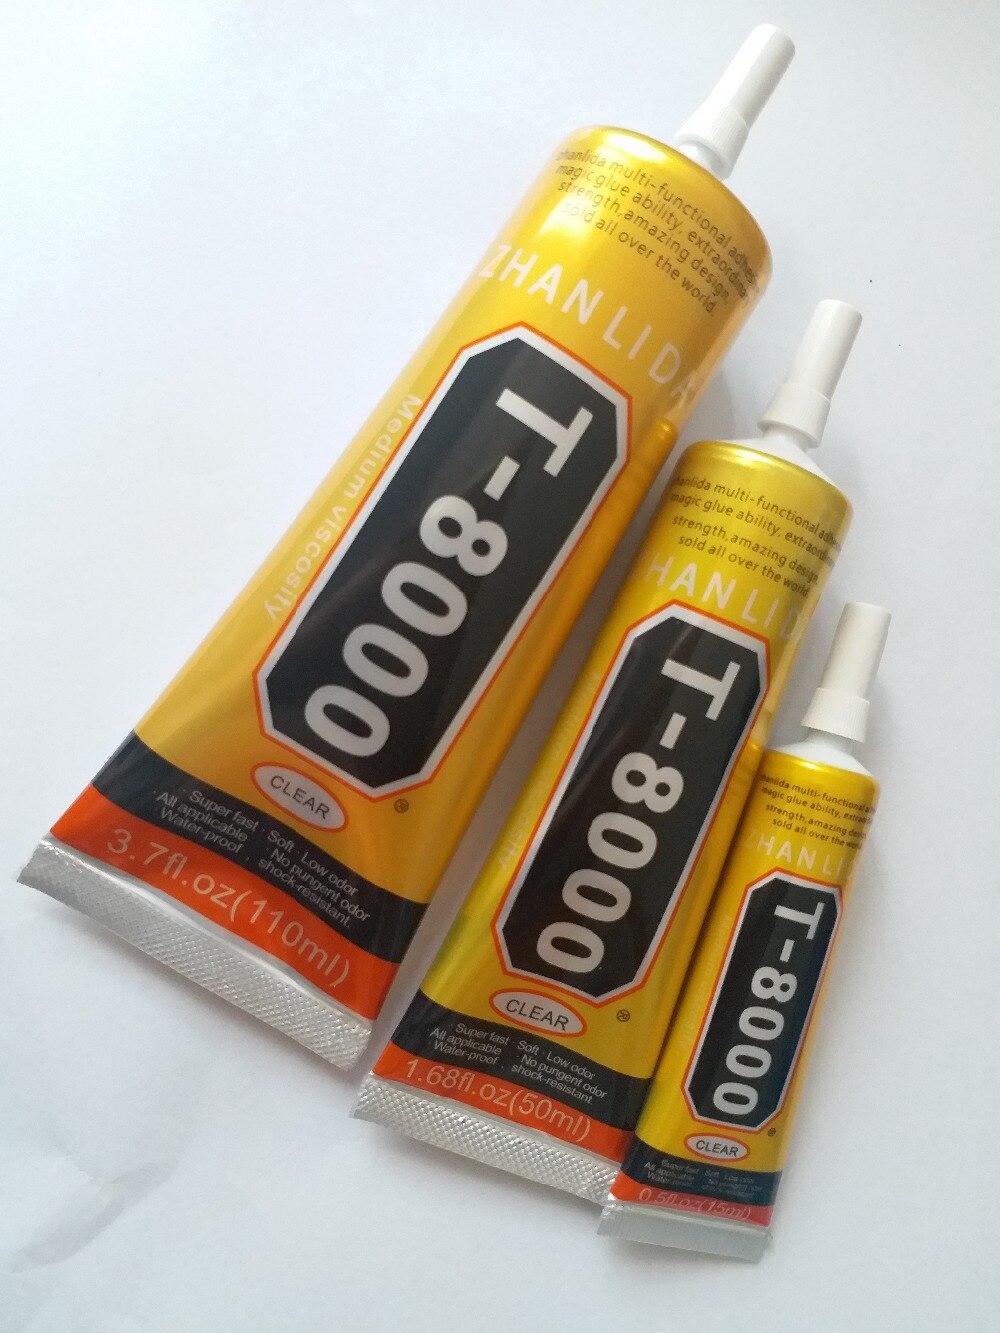 110ml 50ml 15ml T8000 Epoxy Resin  Multi Purpose LED Phone Screen Shell Repair Liquid Glue DIY Tools Better Than B 7000 Sticky|tool diy|tool tooltool led - AliExpress